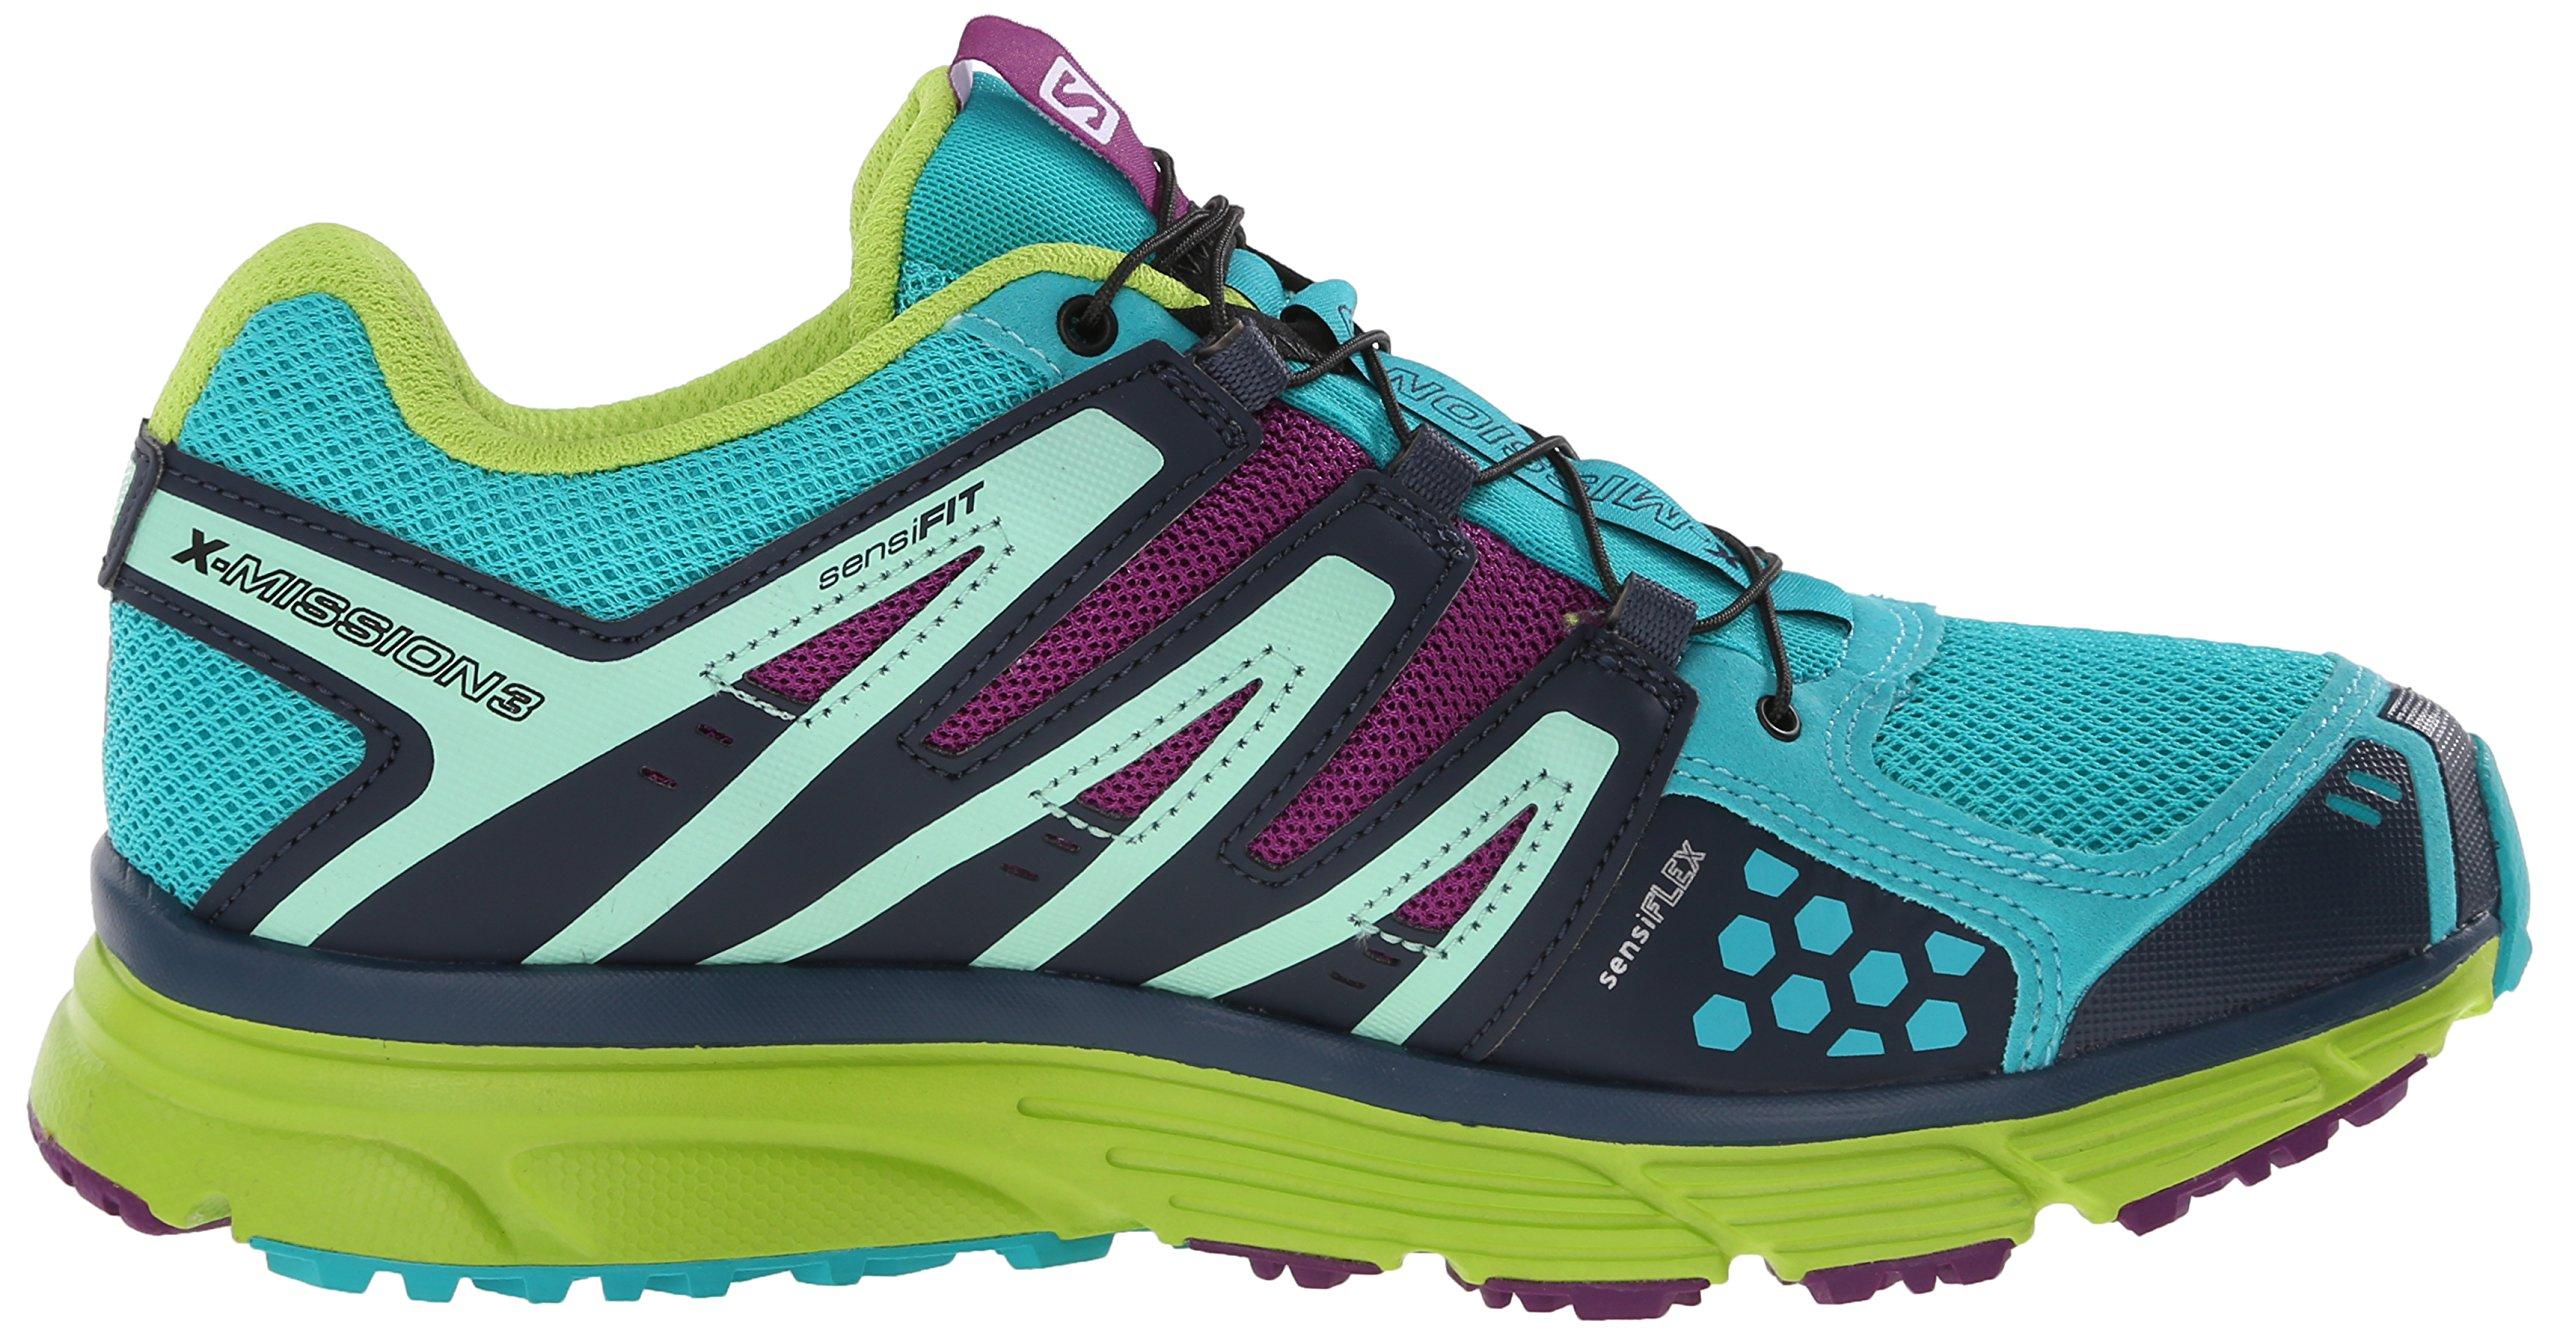 Salomon Women's X-Mission 3 W Trail Running Shoe, Teal Blue/Granny Green/Passion Purple, 7.5 B US by Salomon (Image #7)